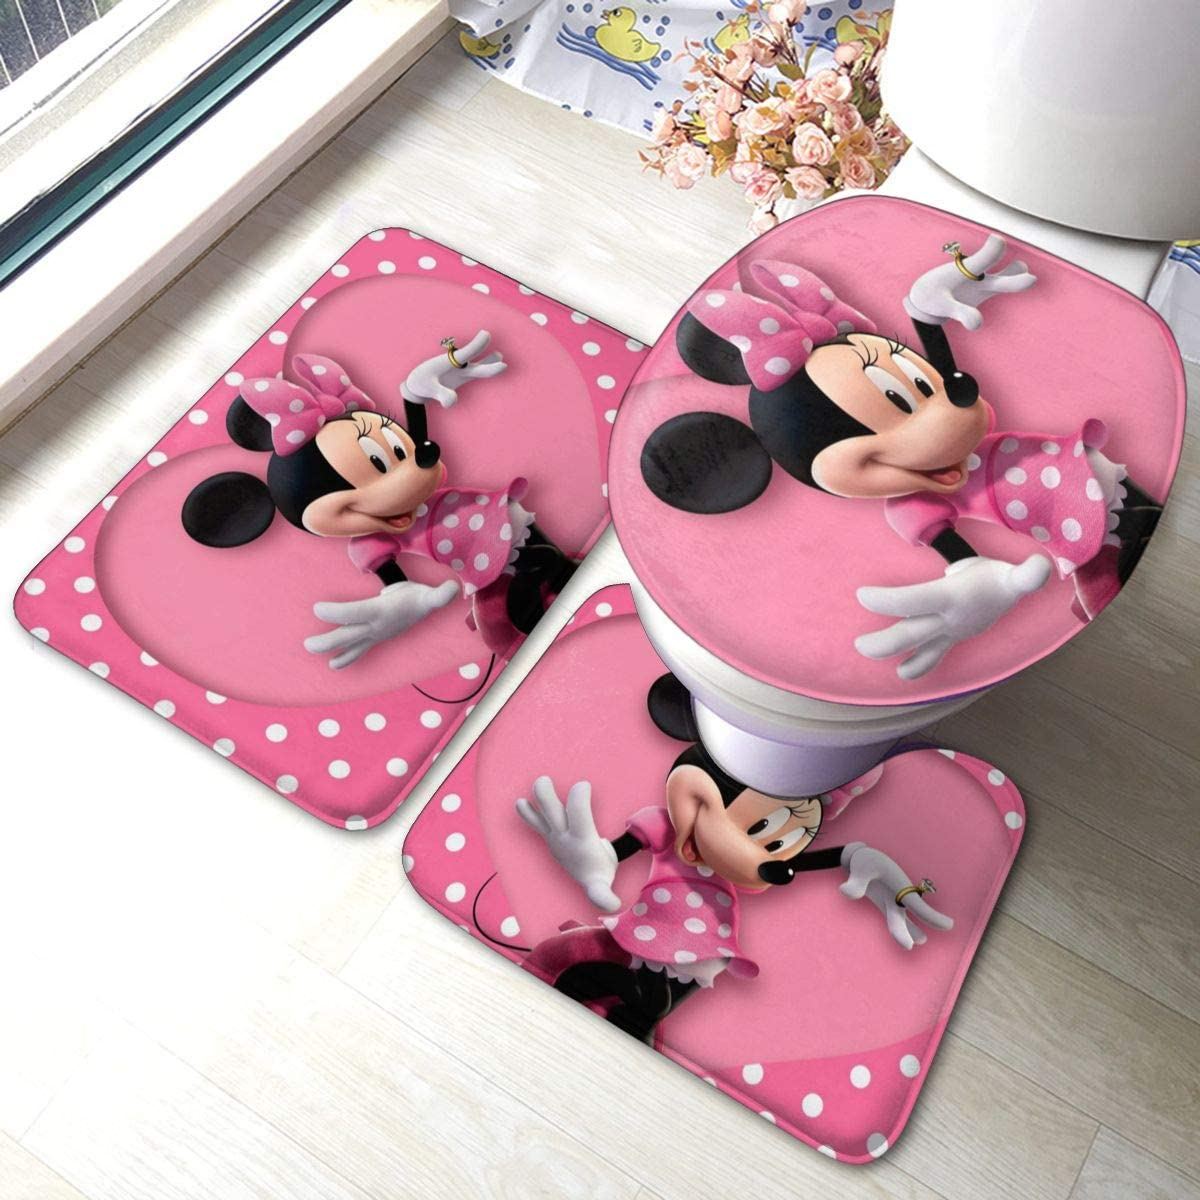 Rainbow Fart Cartoon Mickey Minnie Mouse Bathroom Mat 3-Piece Set, Bathroom U-Shaped Contour Mat/Floor Mat/Toilet Cover Bathroom Carpet Cover, Soft Non Anti-Slip Mats Carpet Bathroom Mat Cover